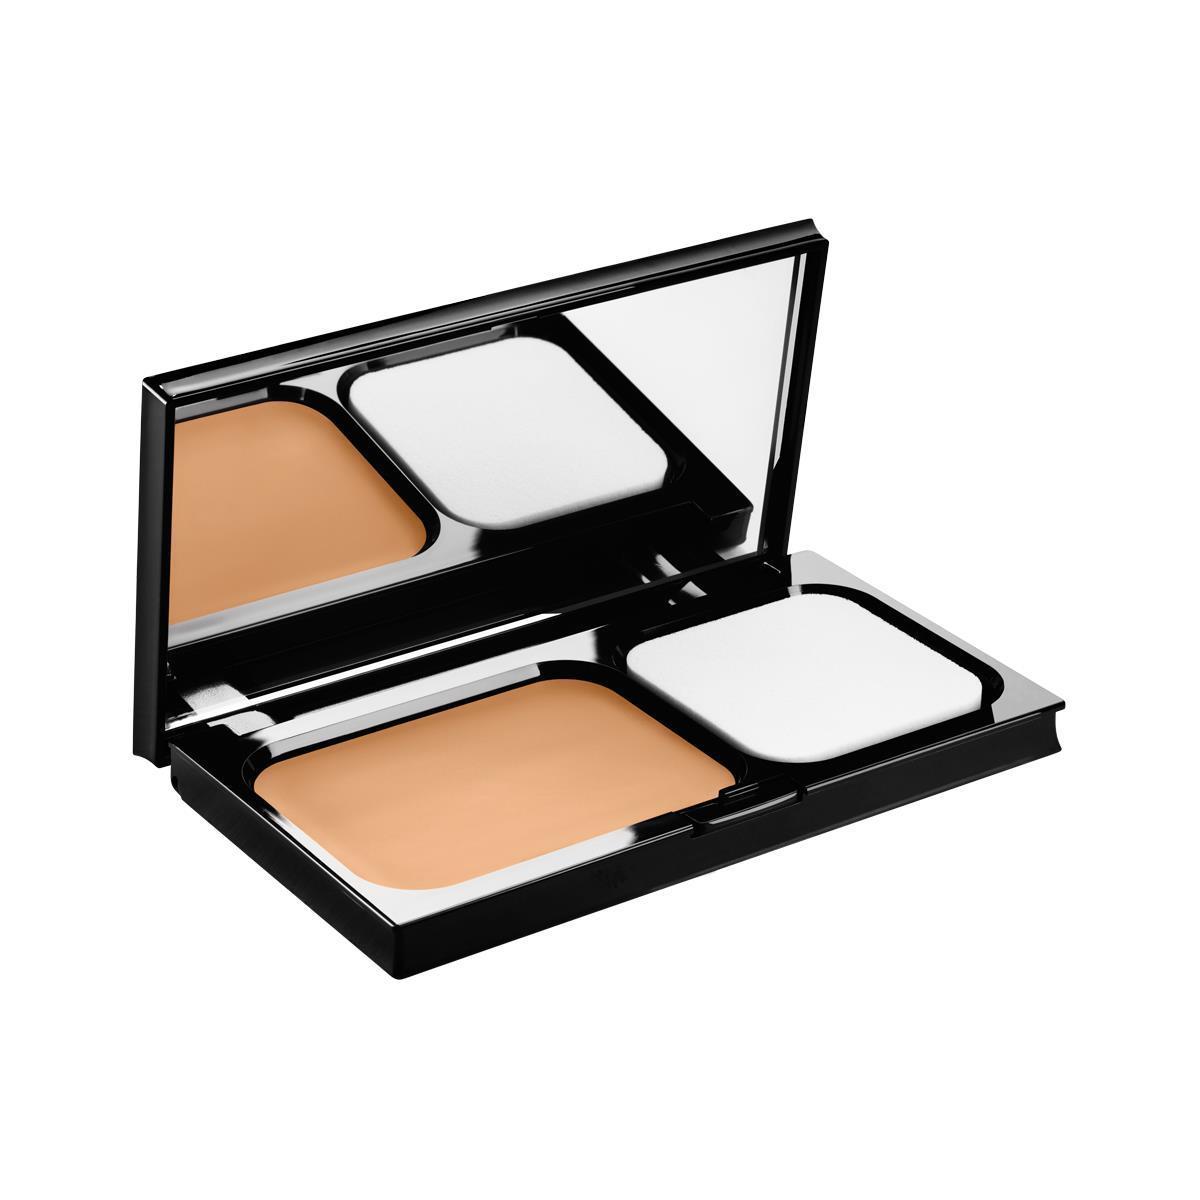 Base De Maquillaje Compacto En Crema 12H 35 Sand 10 Gr